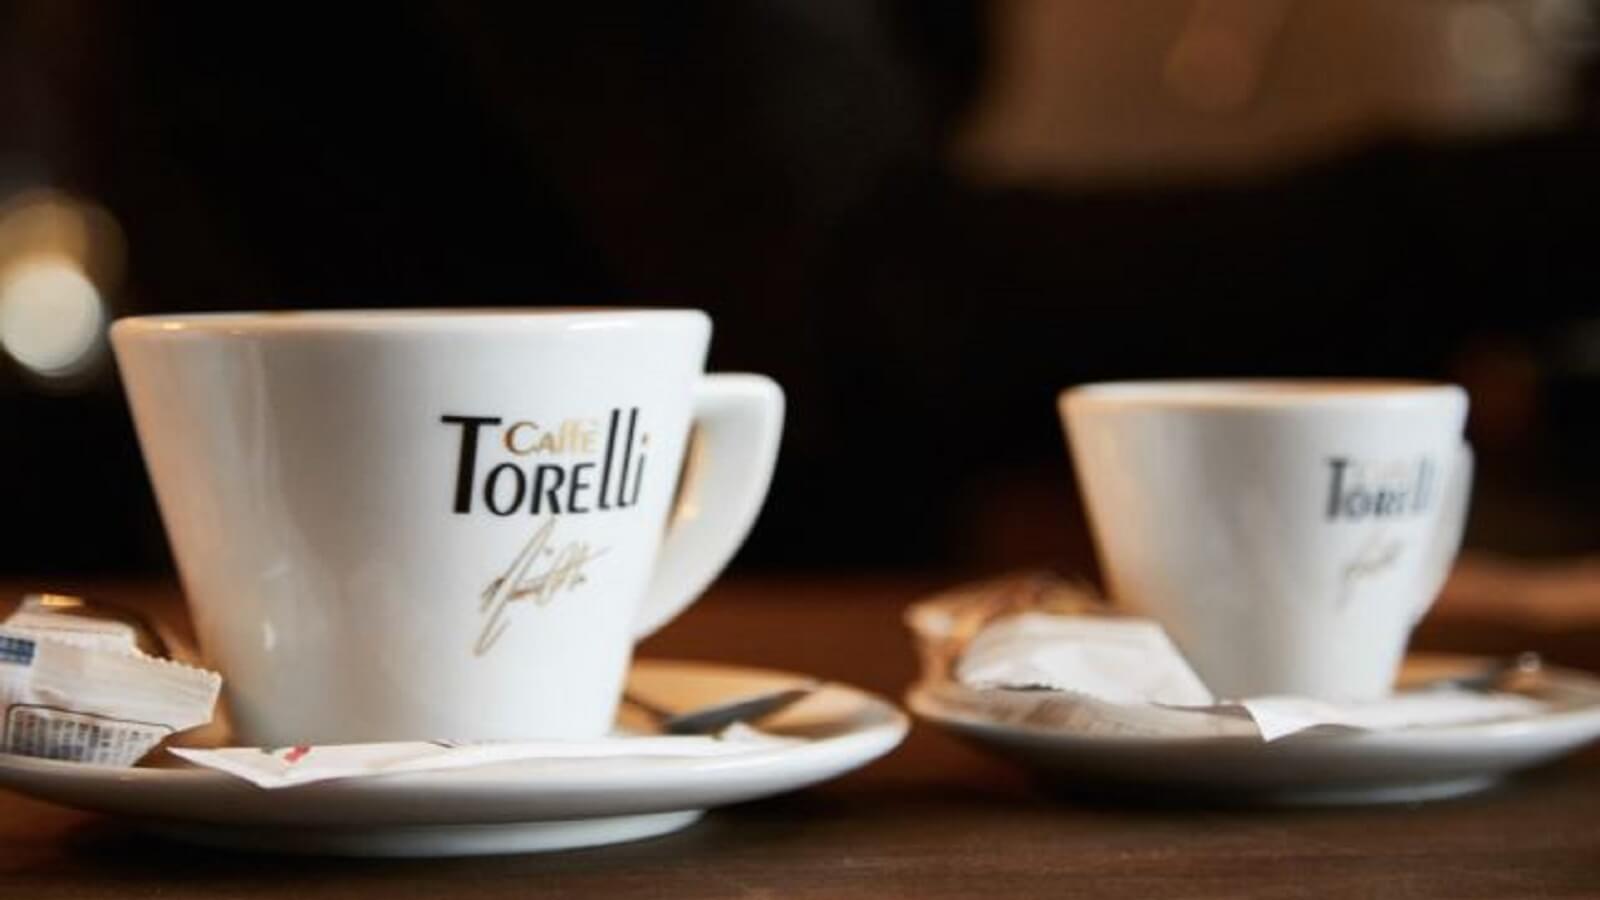 Cafe Torelli